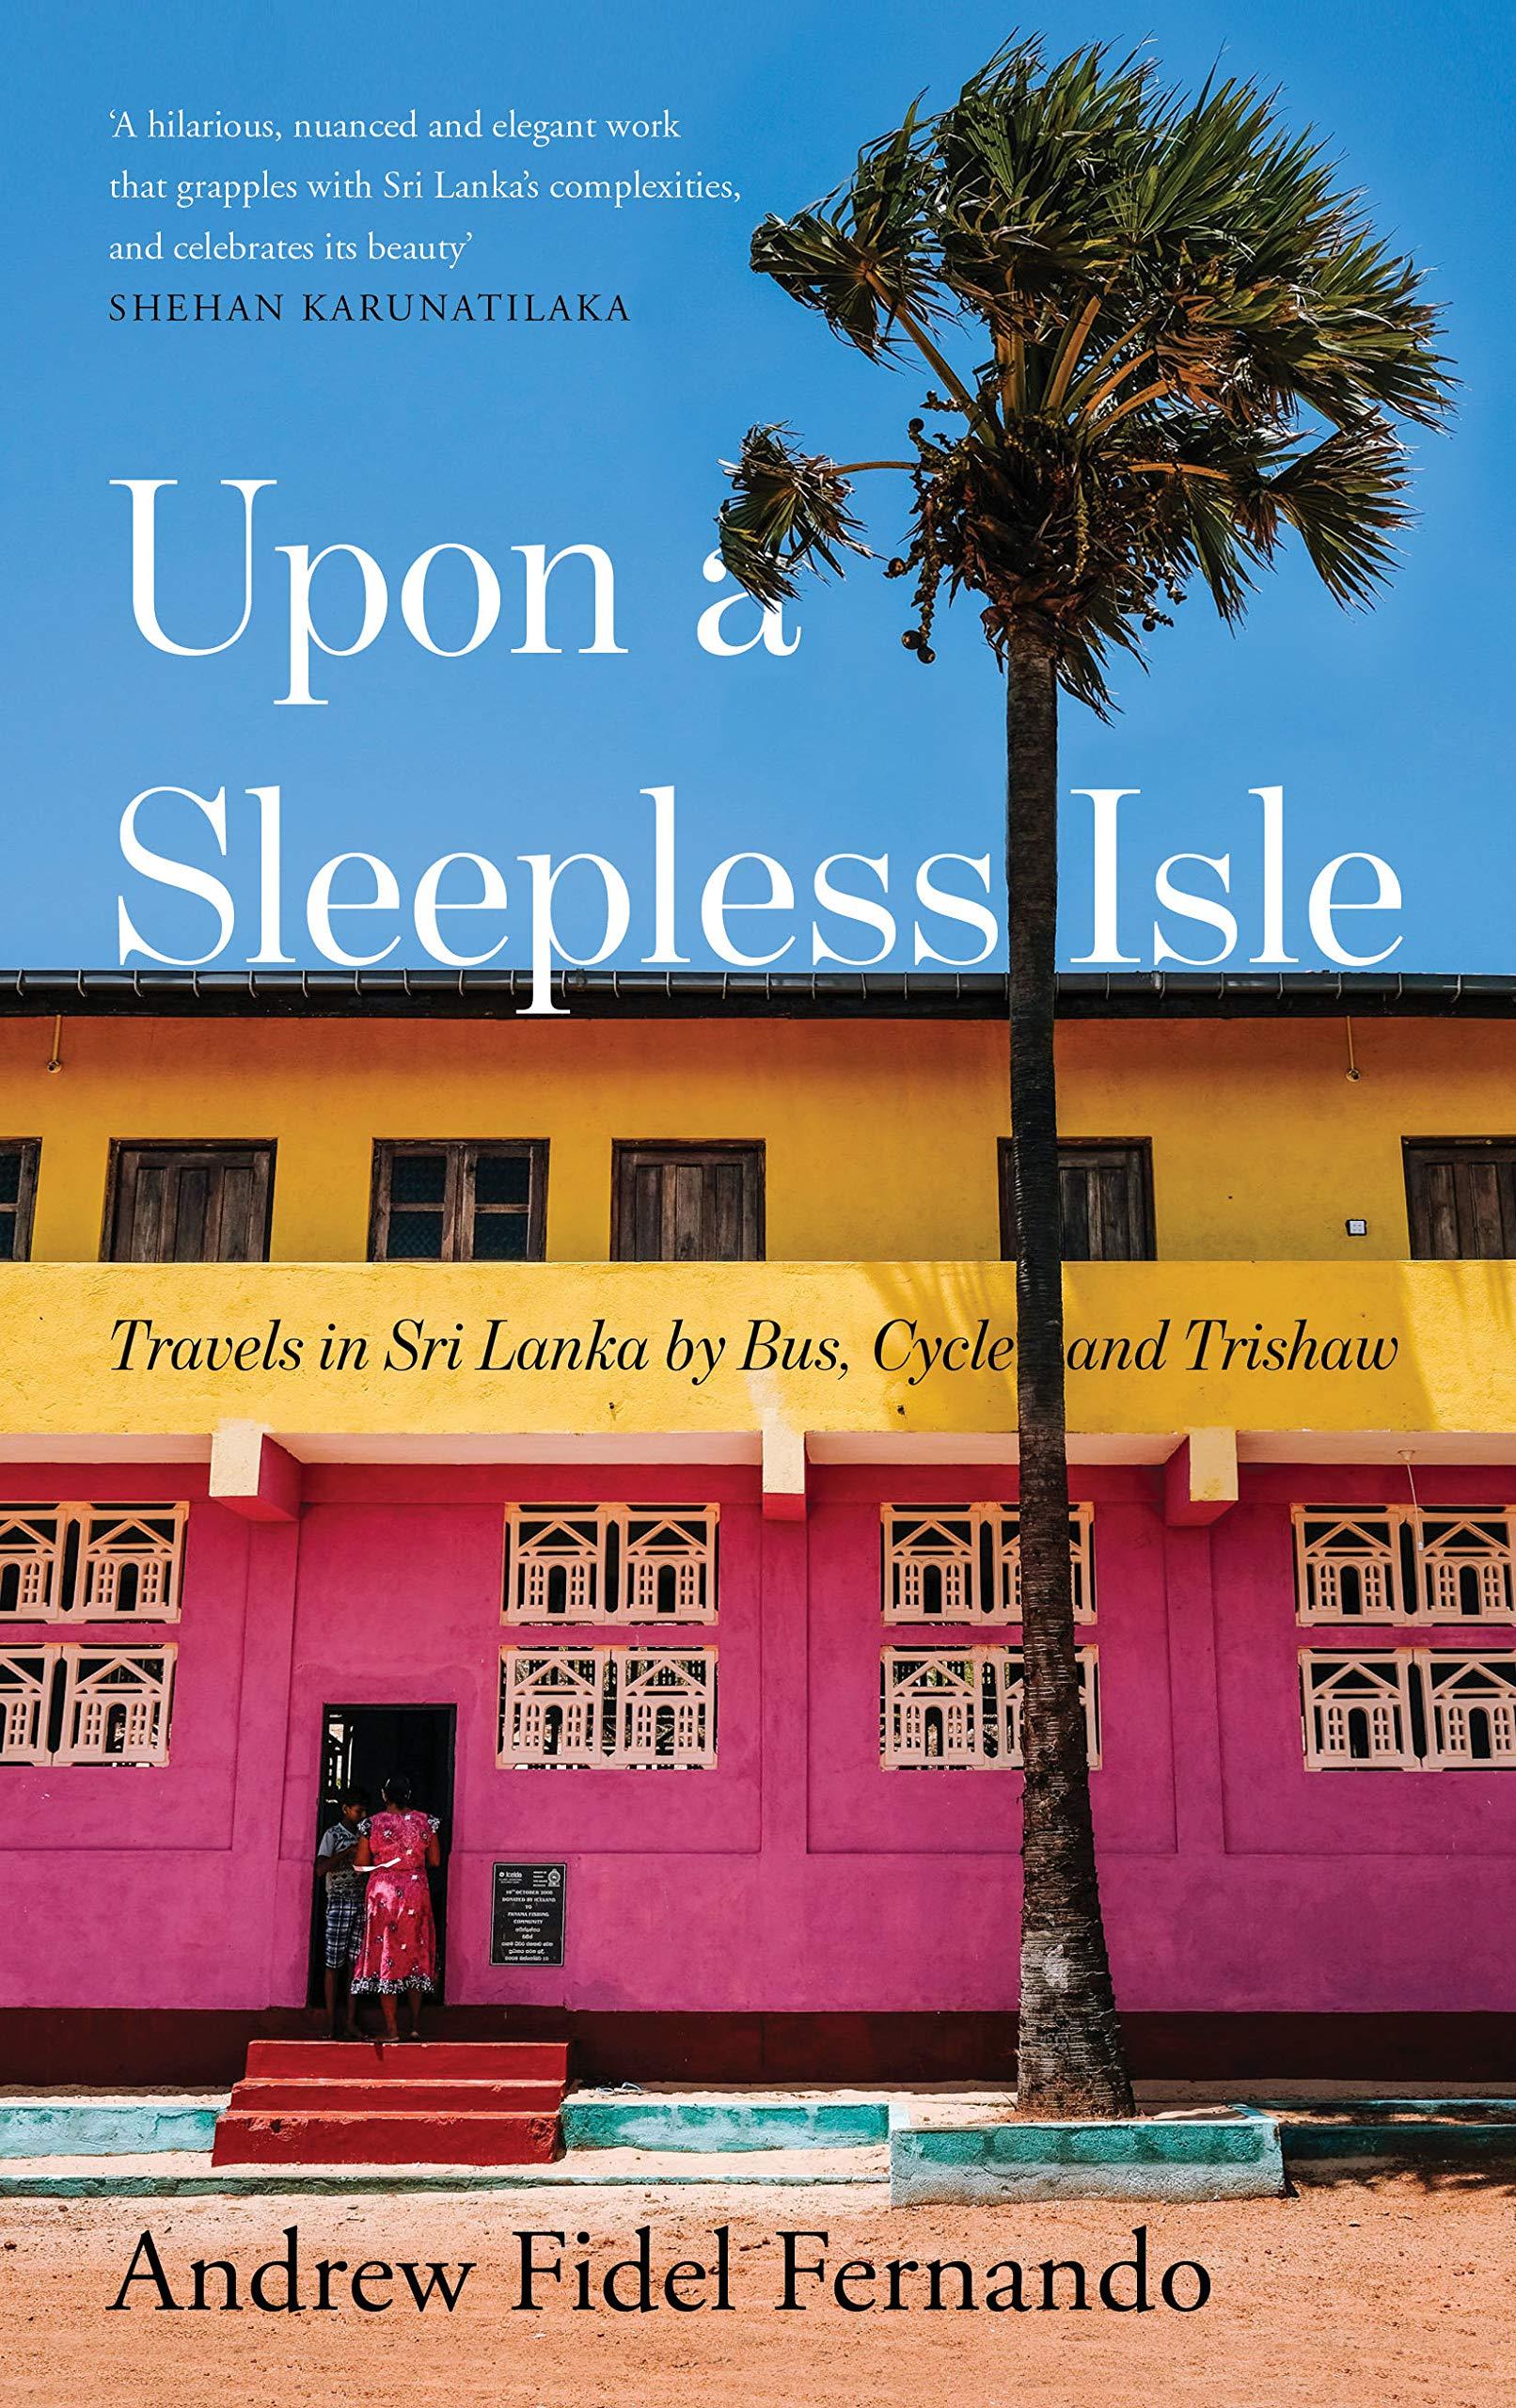 Upon a Sleepless Isle